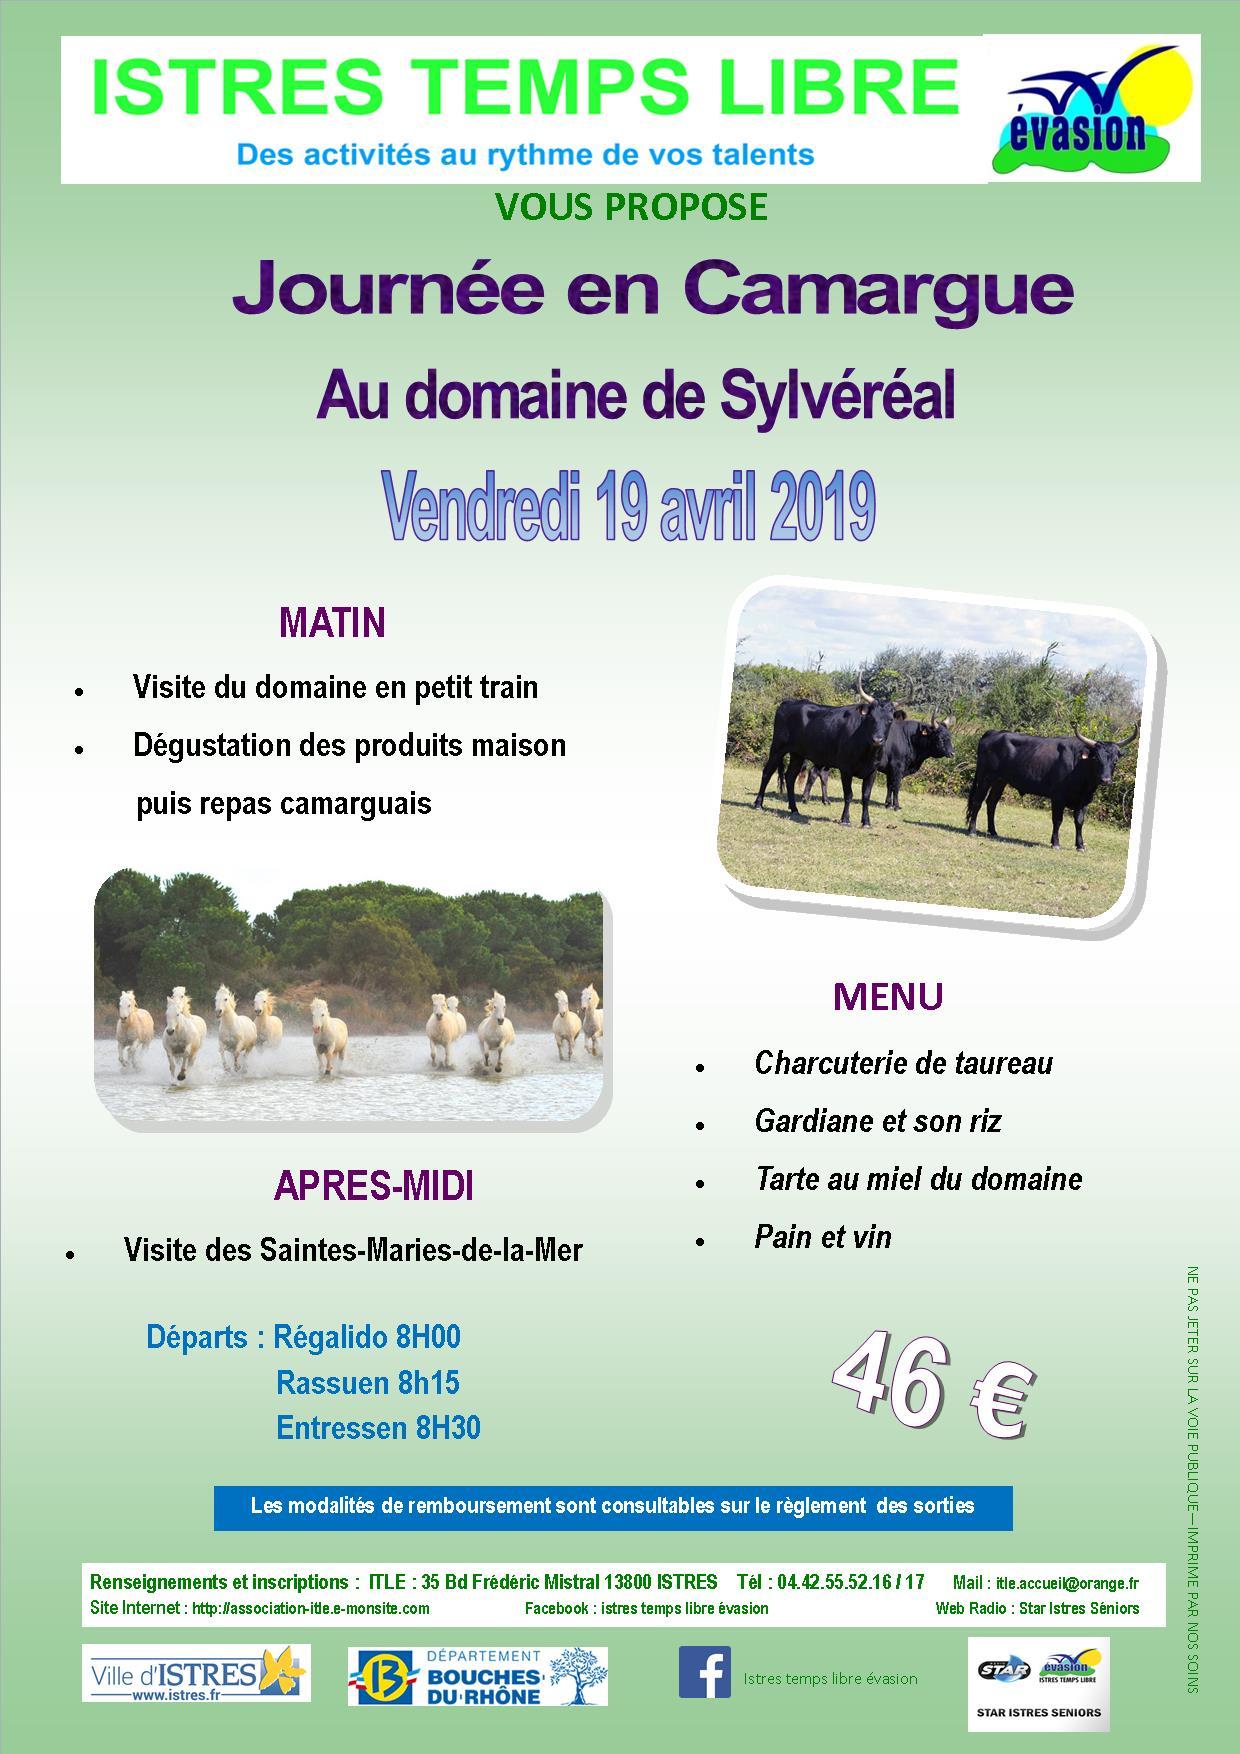 Journee en camargue 19 04 2019